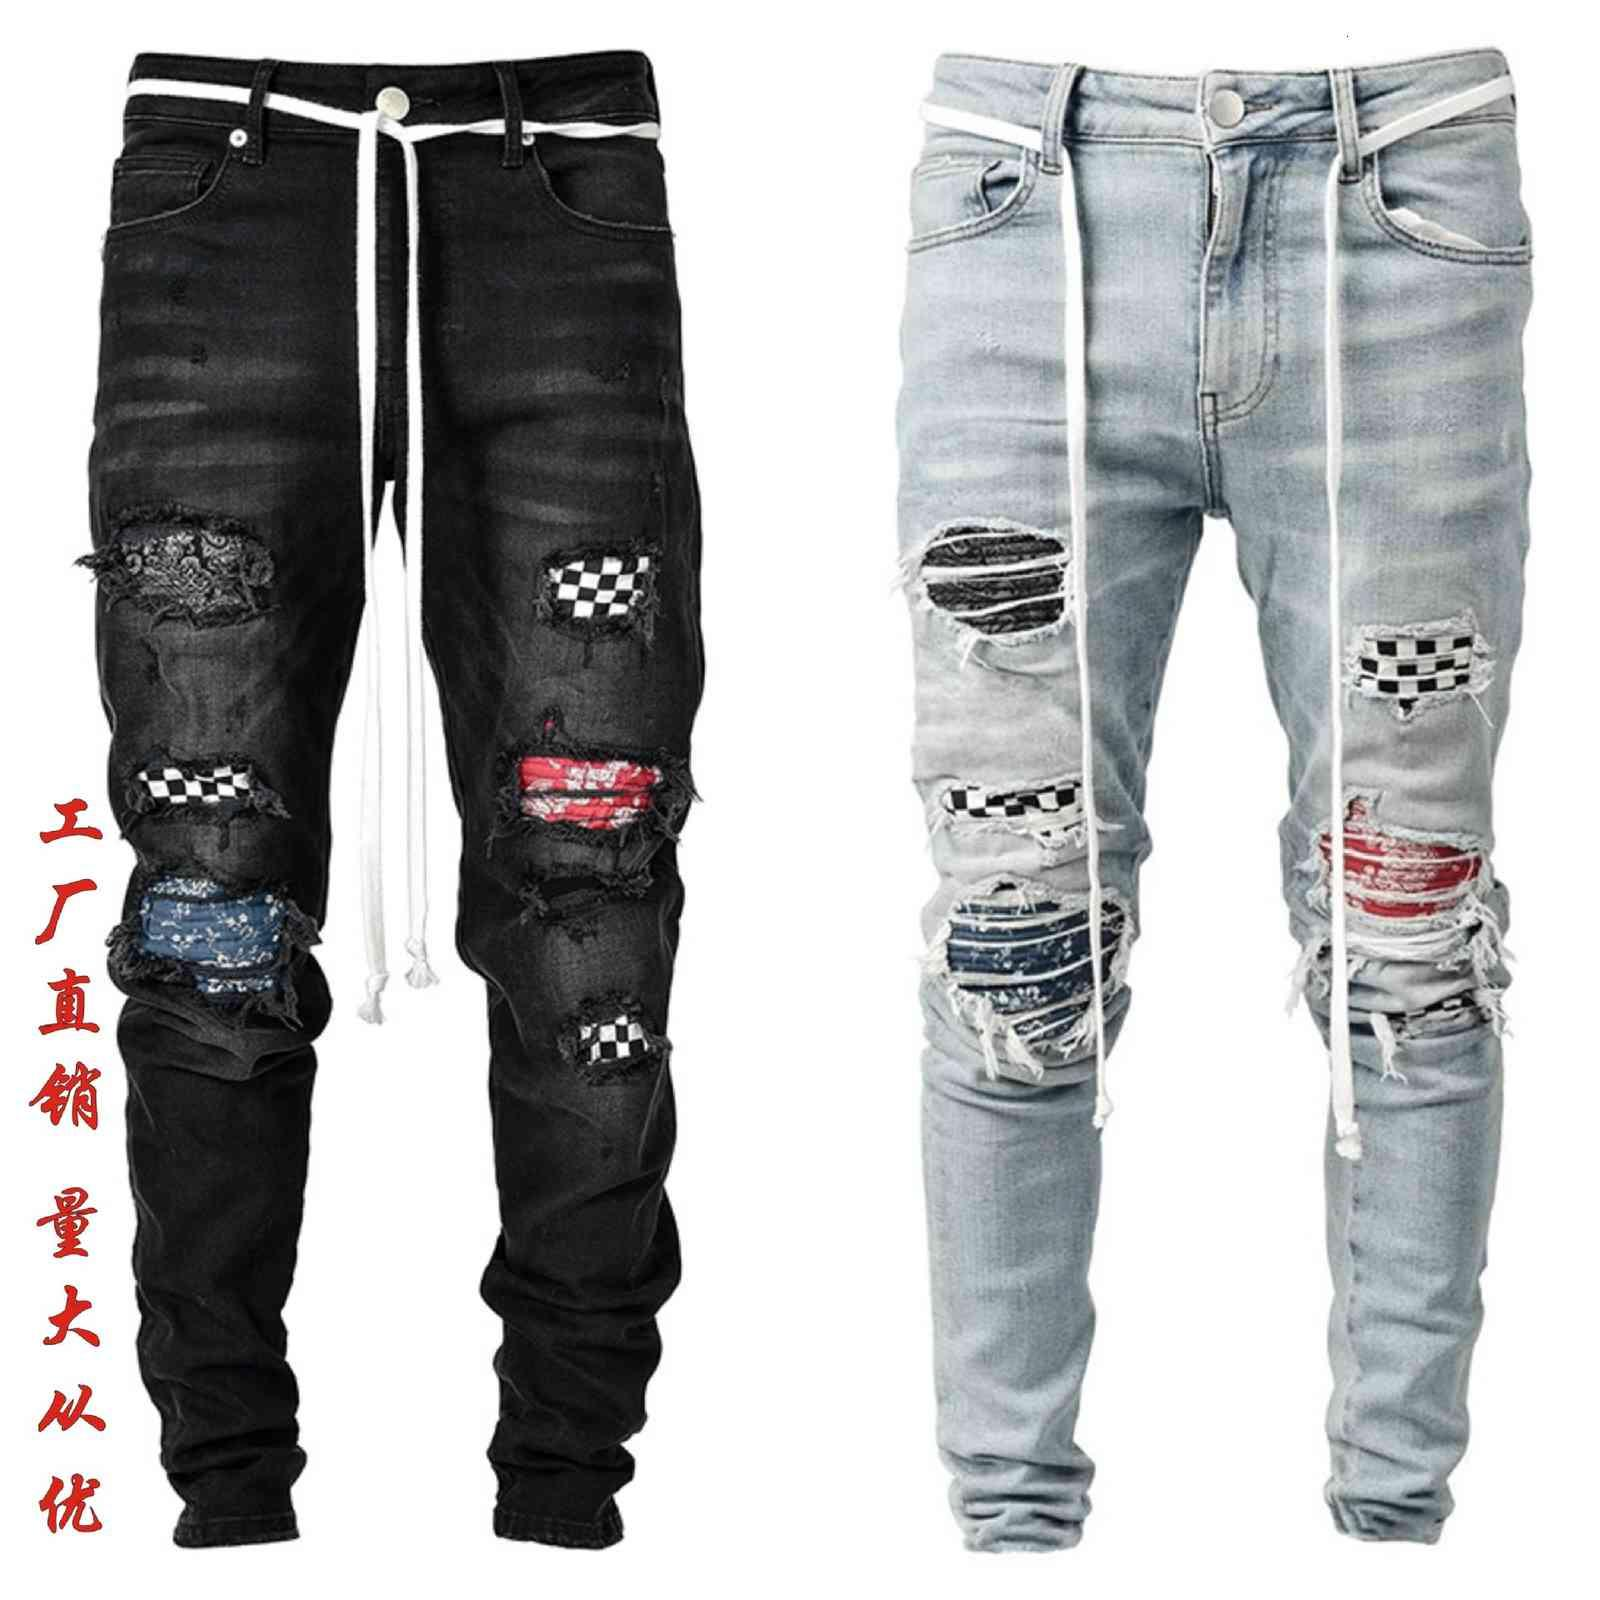 2021 High End Slim Hole Leggings Neue Männer Jeans Männer